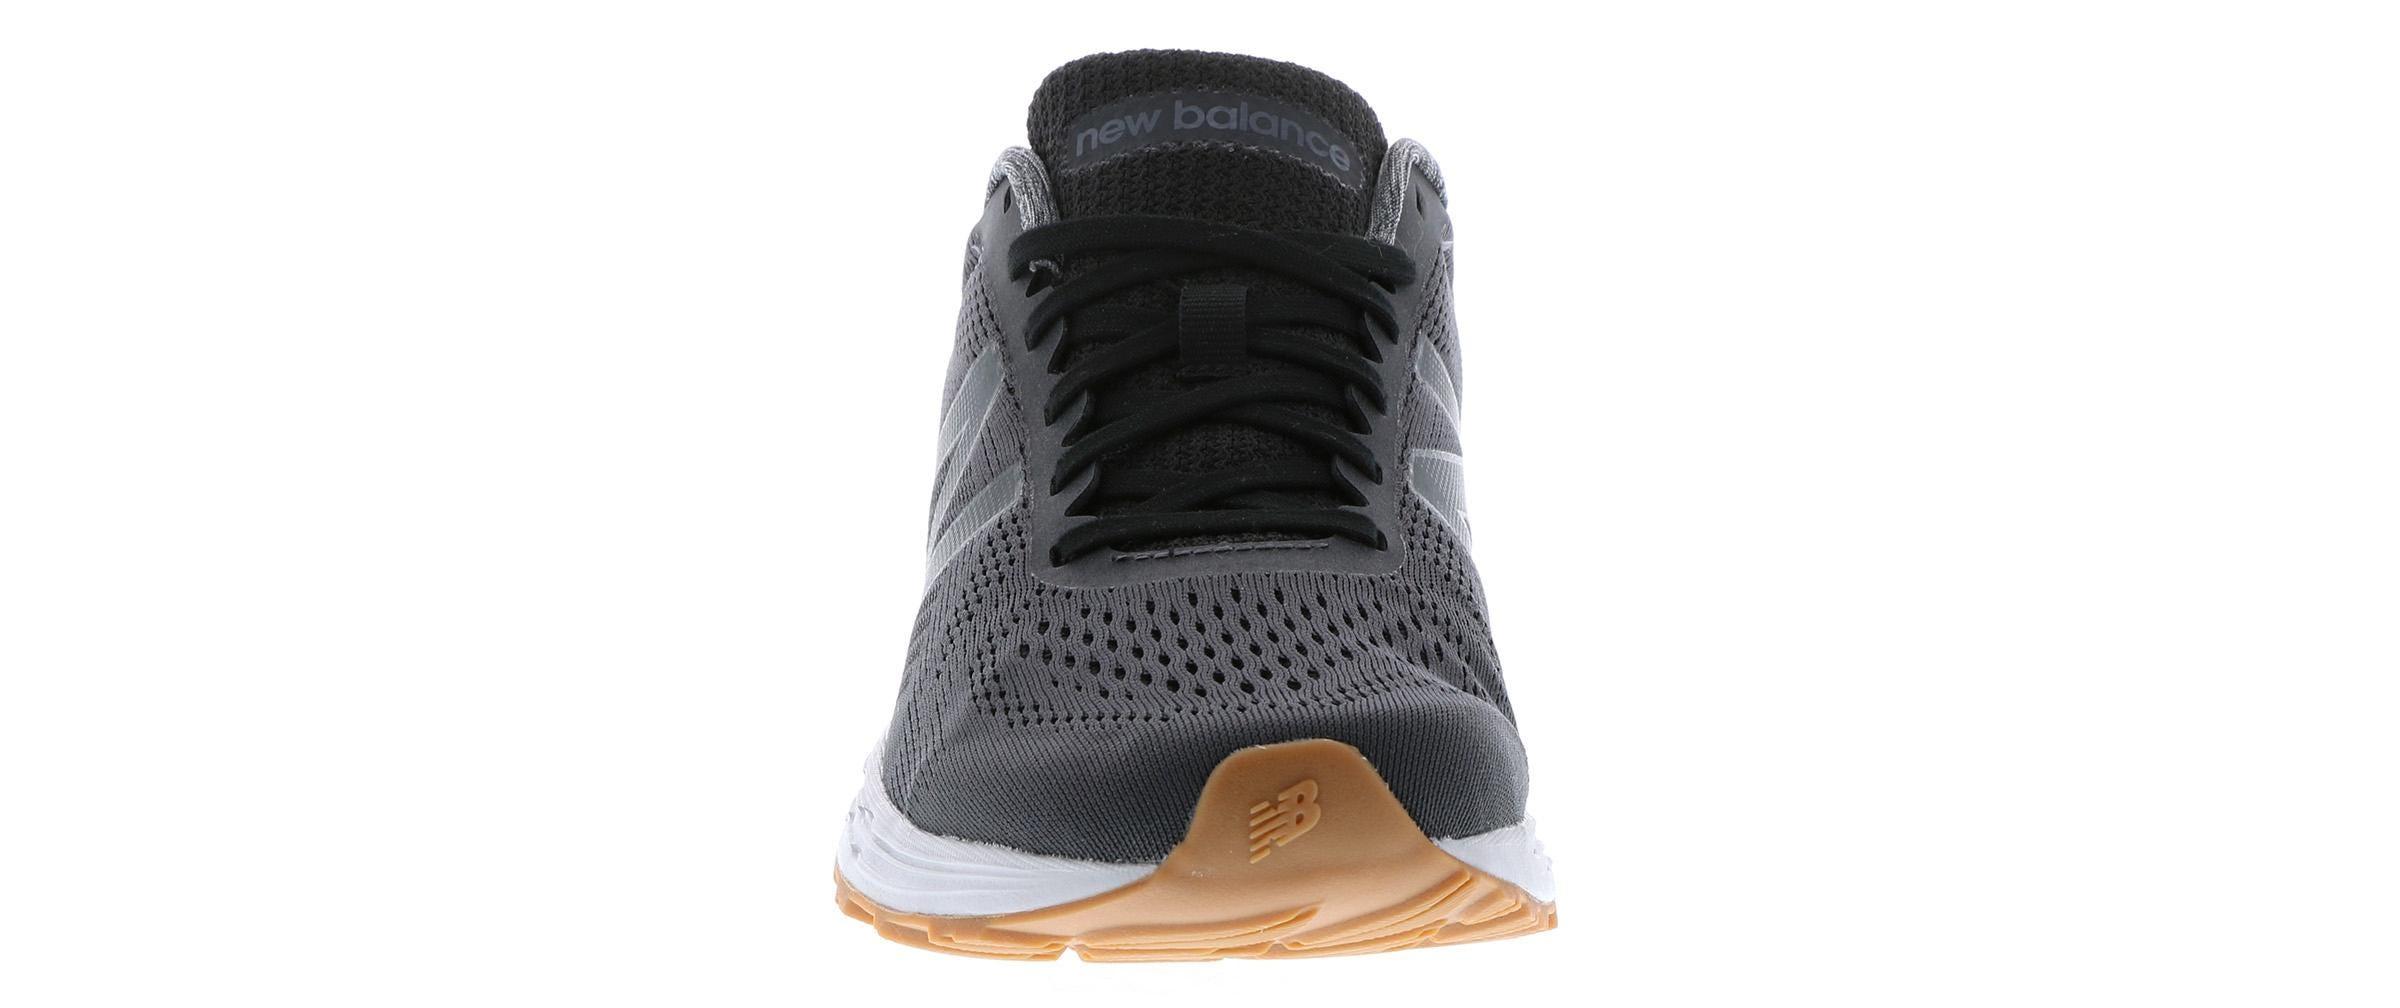 the latest 7e838 94d07 Men's New Balance Fresh Foam Arishi 4E Wide Grey | Shoe ...